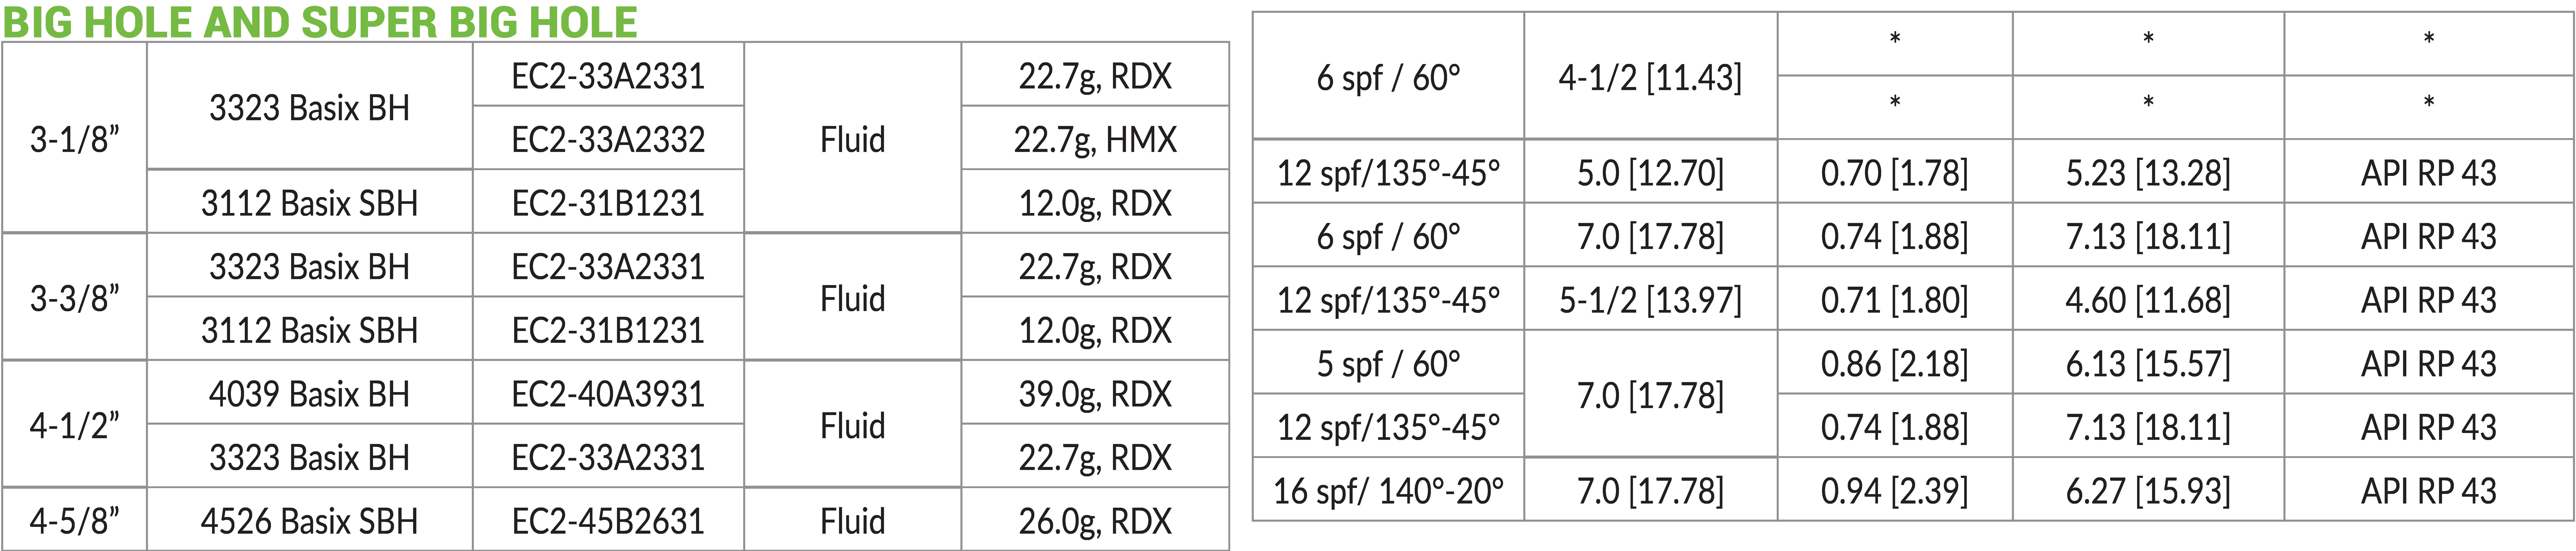 Basix Tables_2020_05_08_BIG HOLE & SUPER BIG HOLE